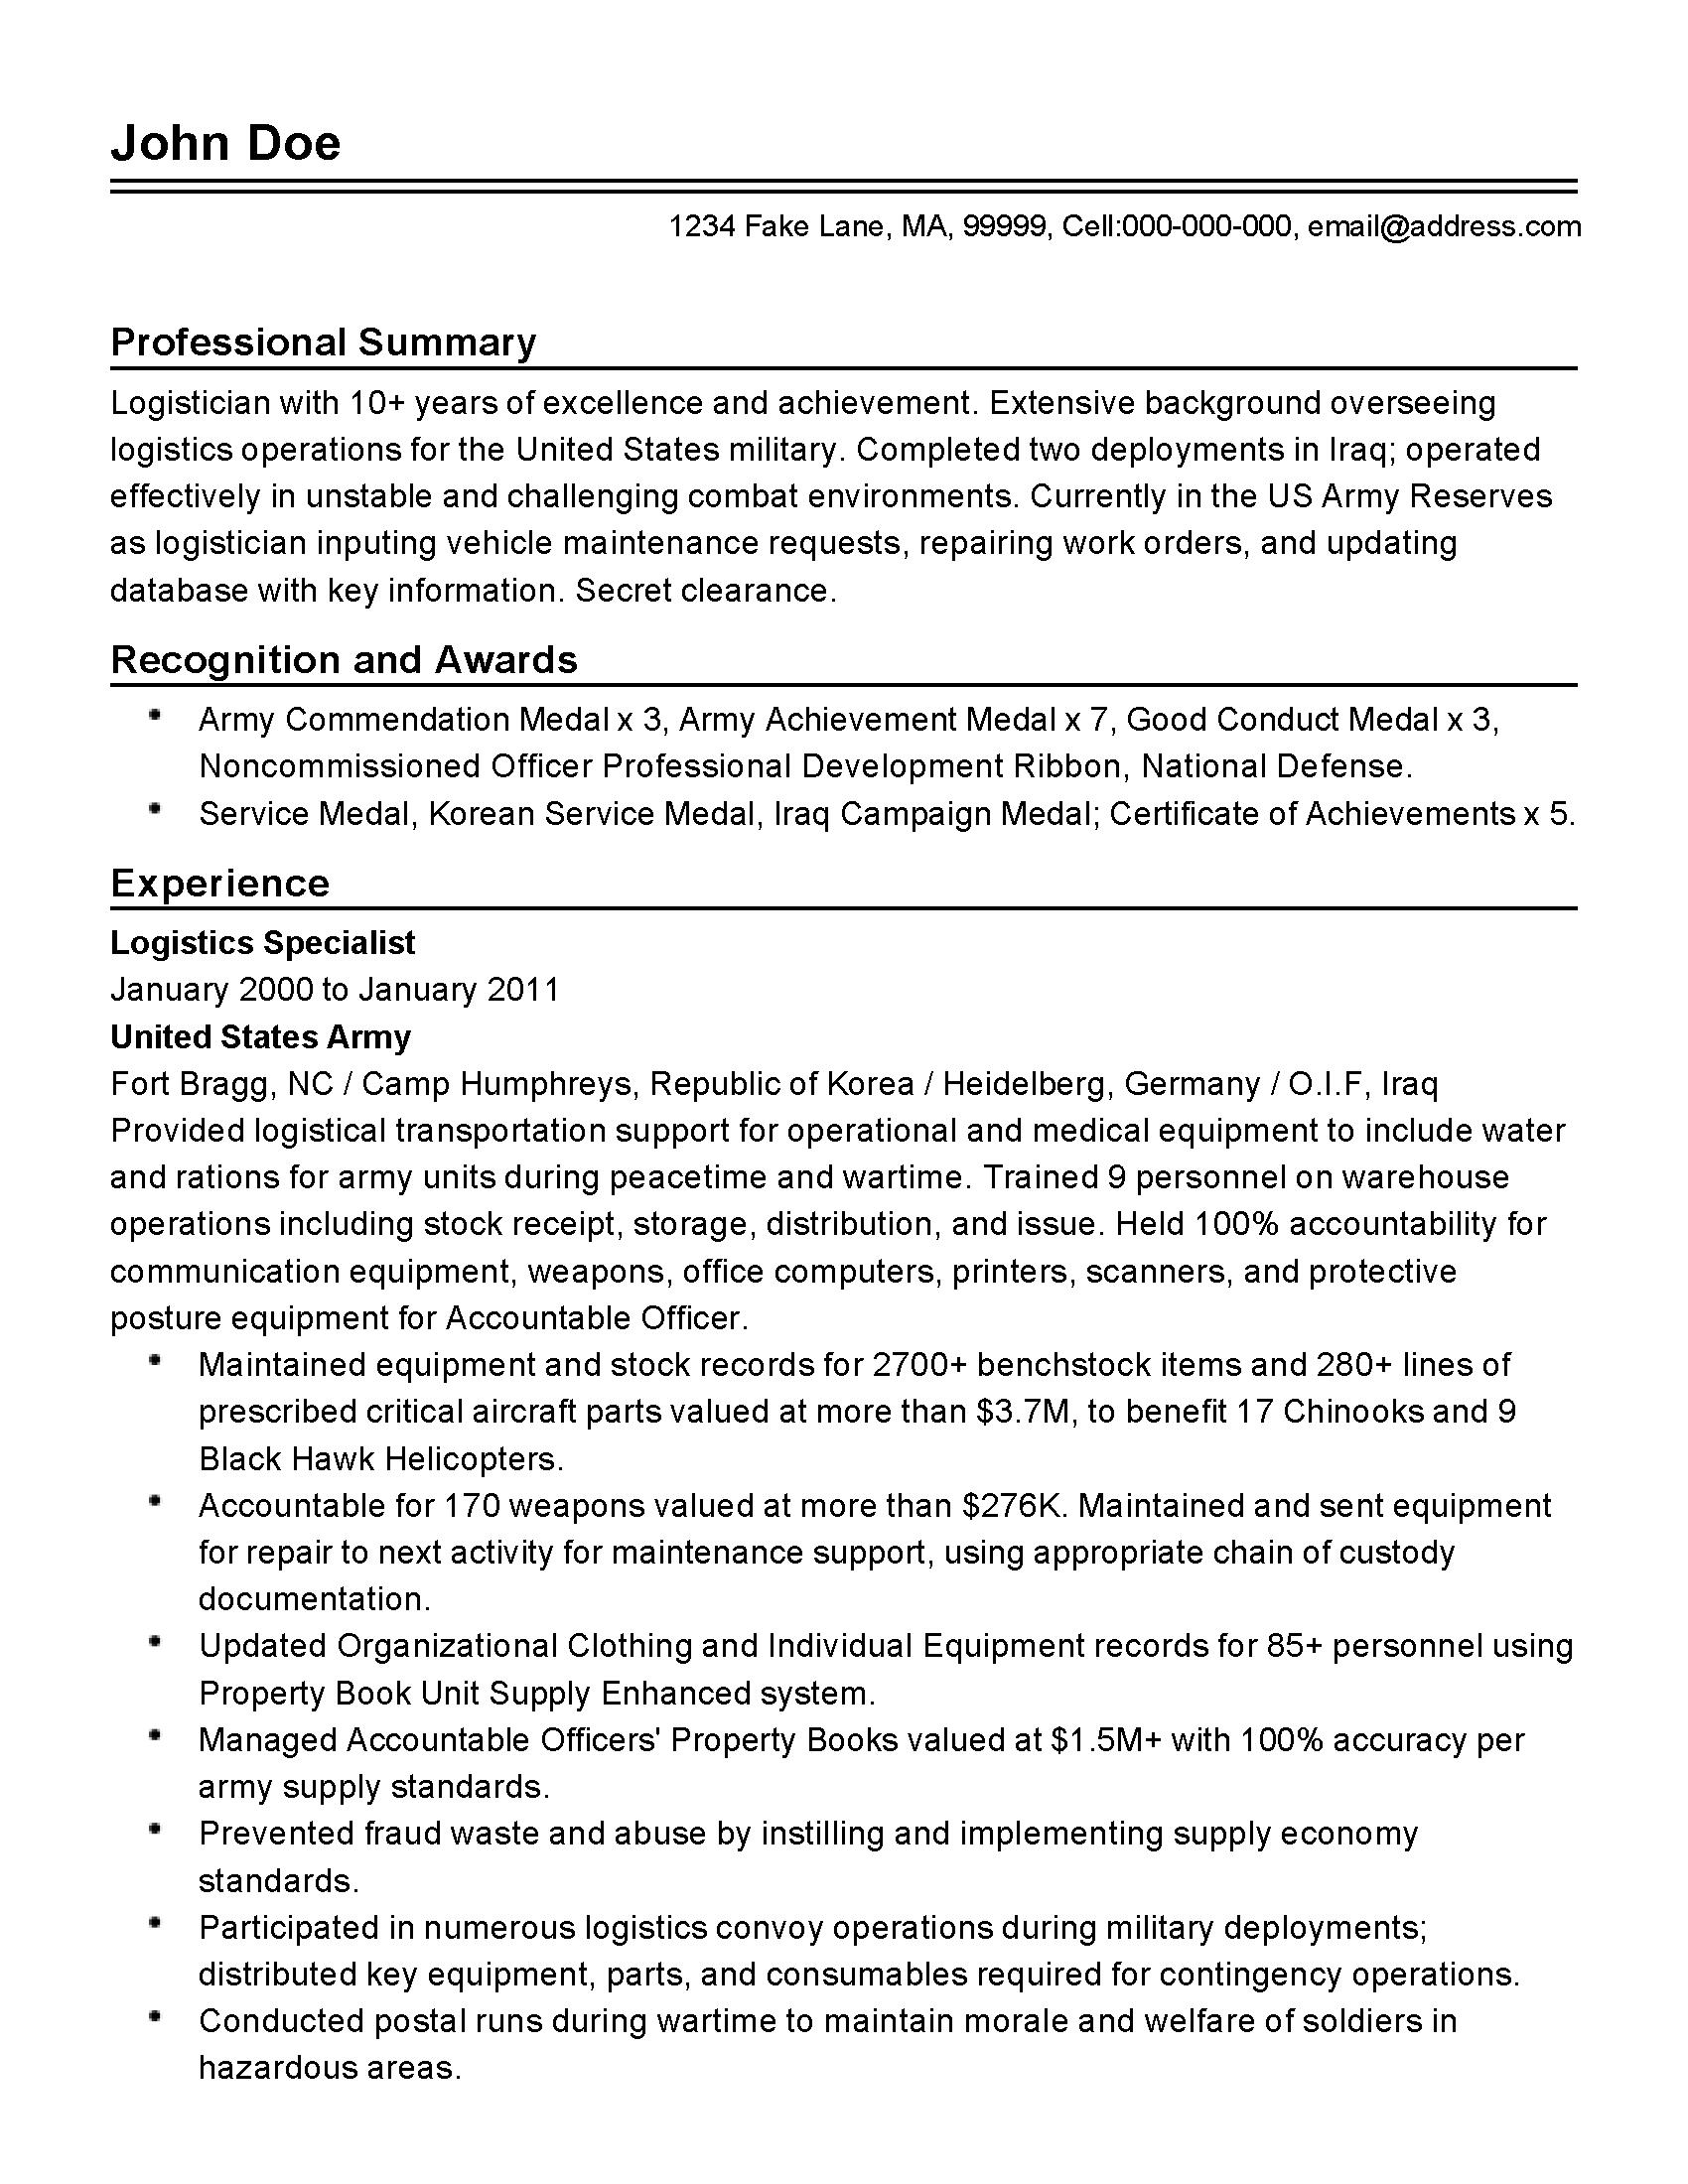 Resume maker professional 11.0 full download serfaving